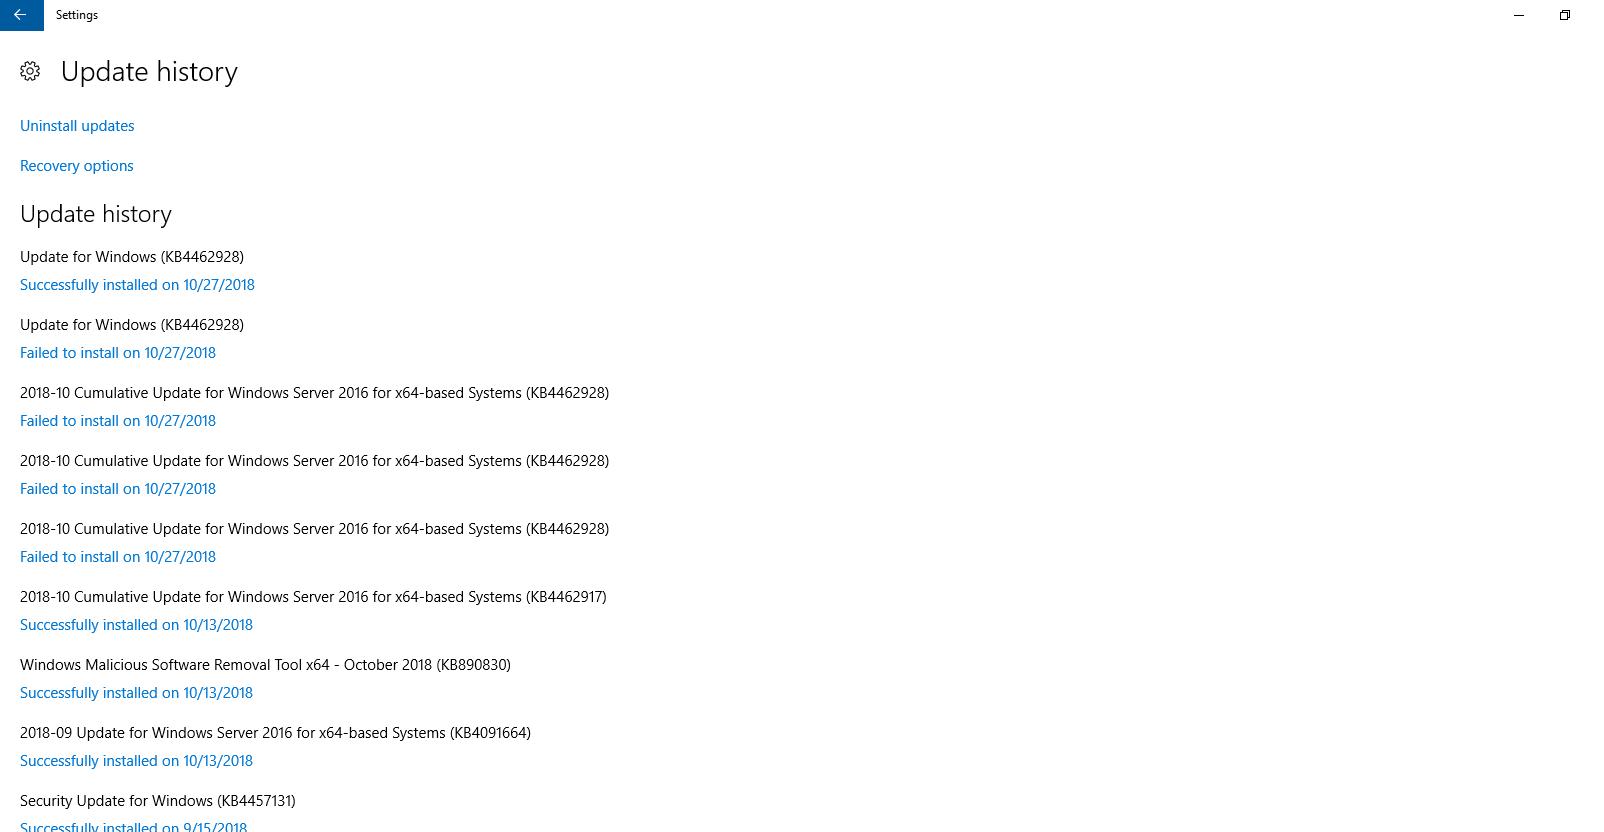 Powershell script to get list of all updates(windows updates/office